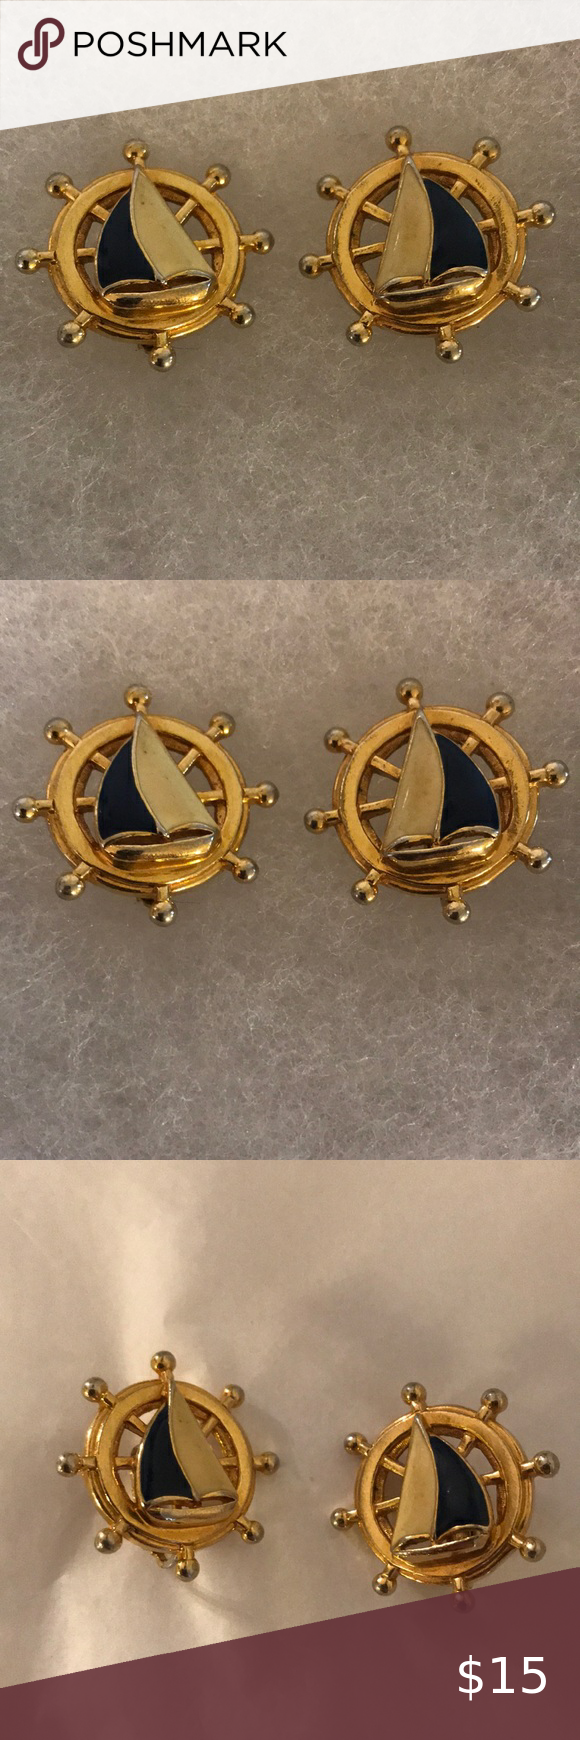 Vintage Avon Sailboat Gold Clip On Earrings H In 2020 Gold Clips Clip On Earrings Vintage Avon